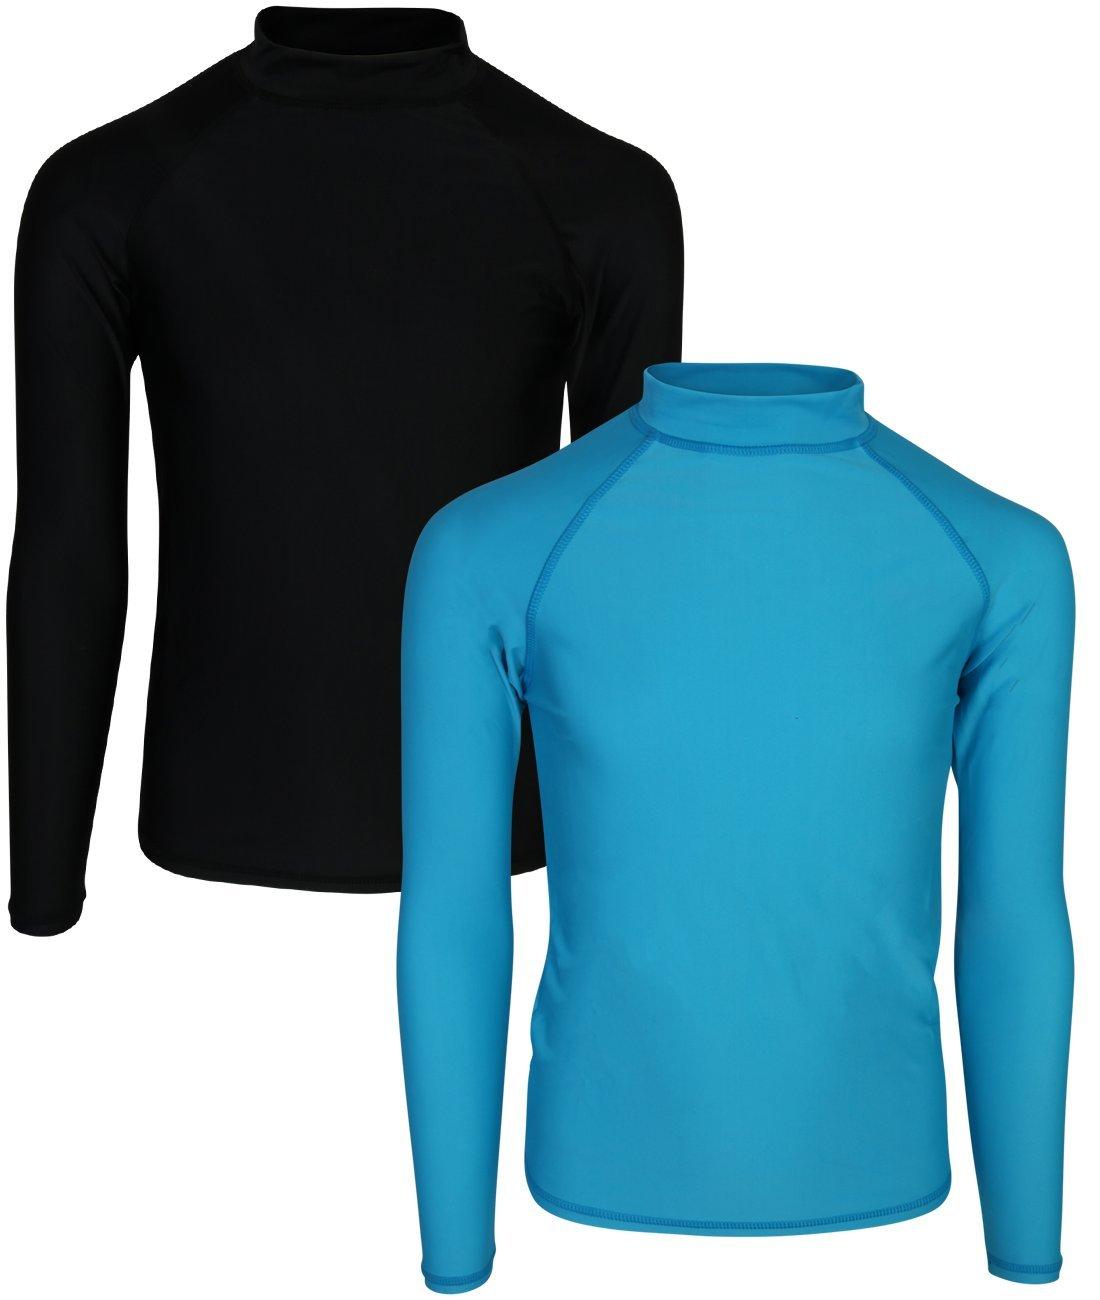 Ingear Swim Girl's Long Sleeve Rash Guard UPF 50+ Shirt (2 Pack)